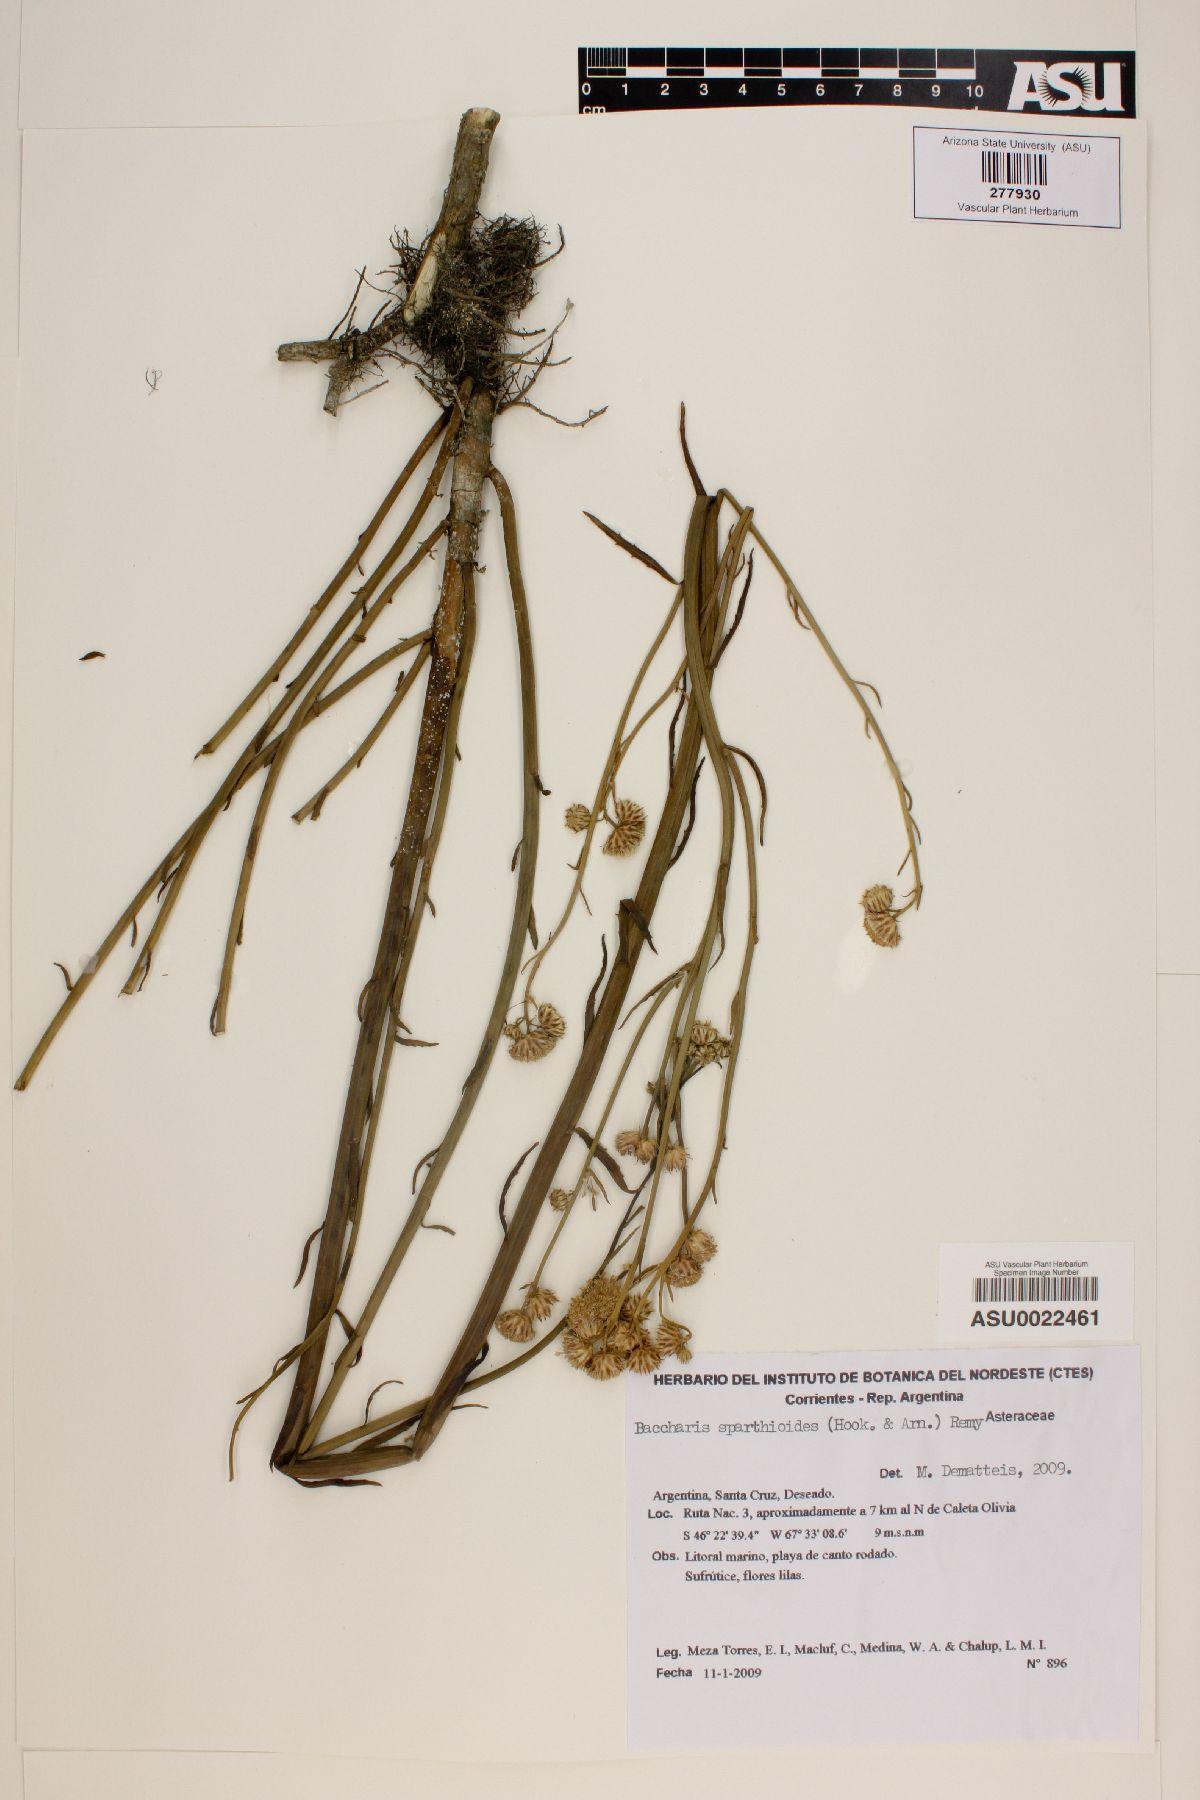 Baccharis spartioides image